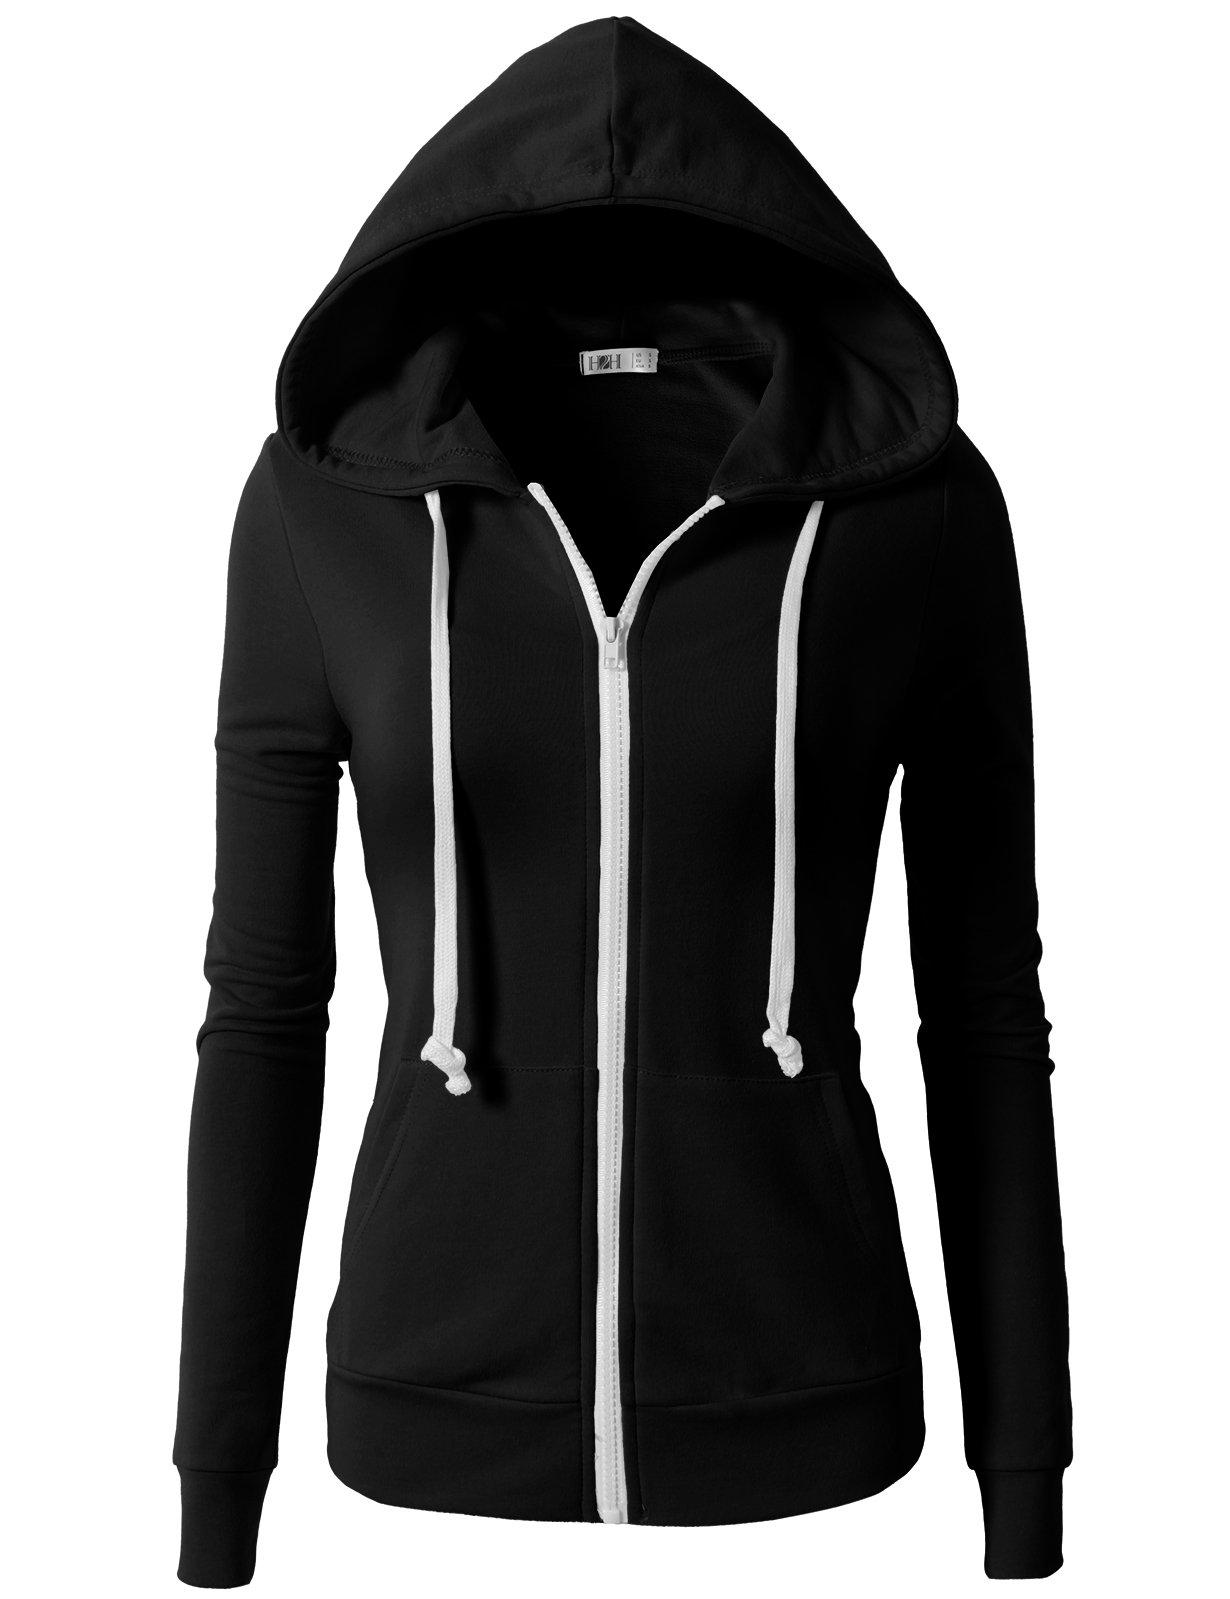 H2H Womens Casual Regular Fit Zip up Long Sleeve Hoodie Jacket Black US XL/Asia XL (CWOHOL020)